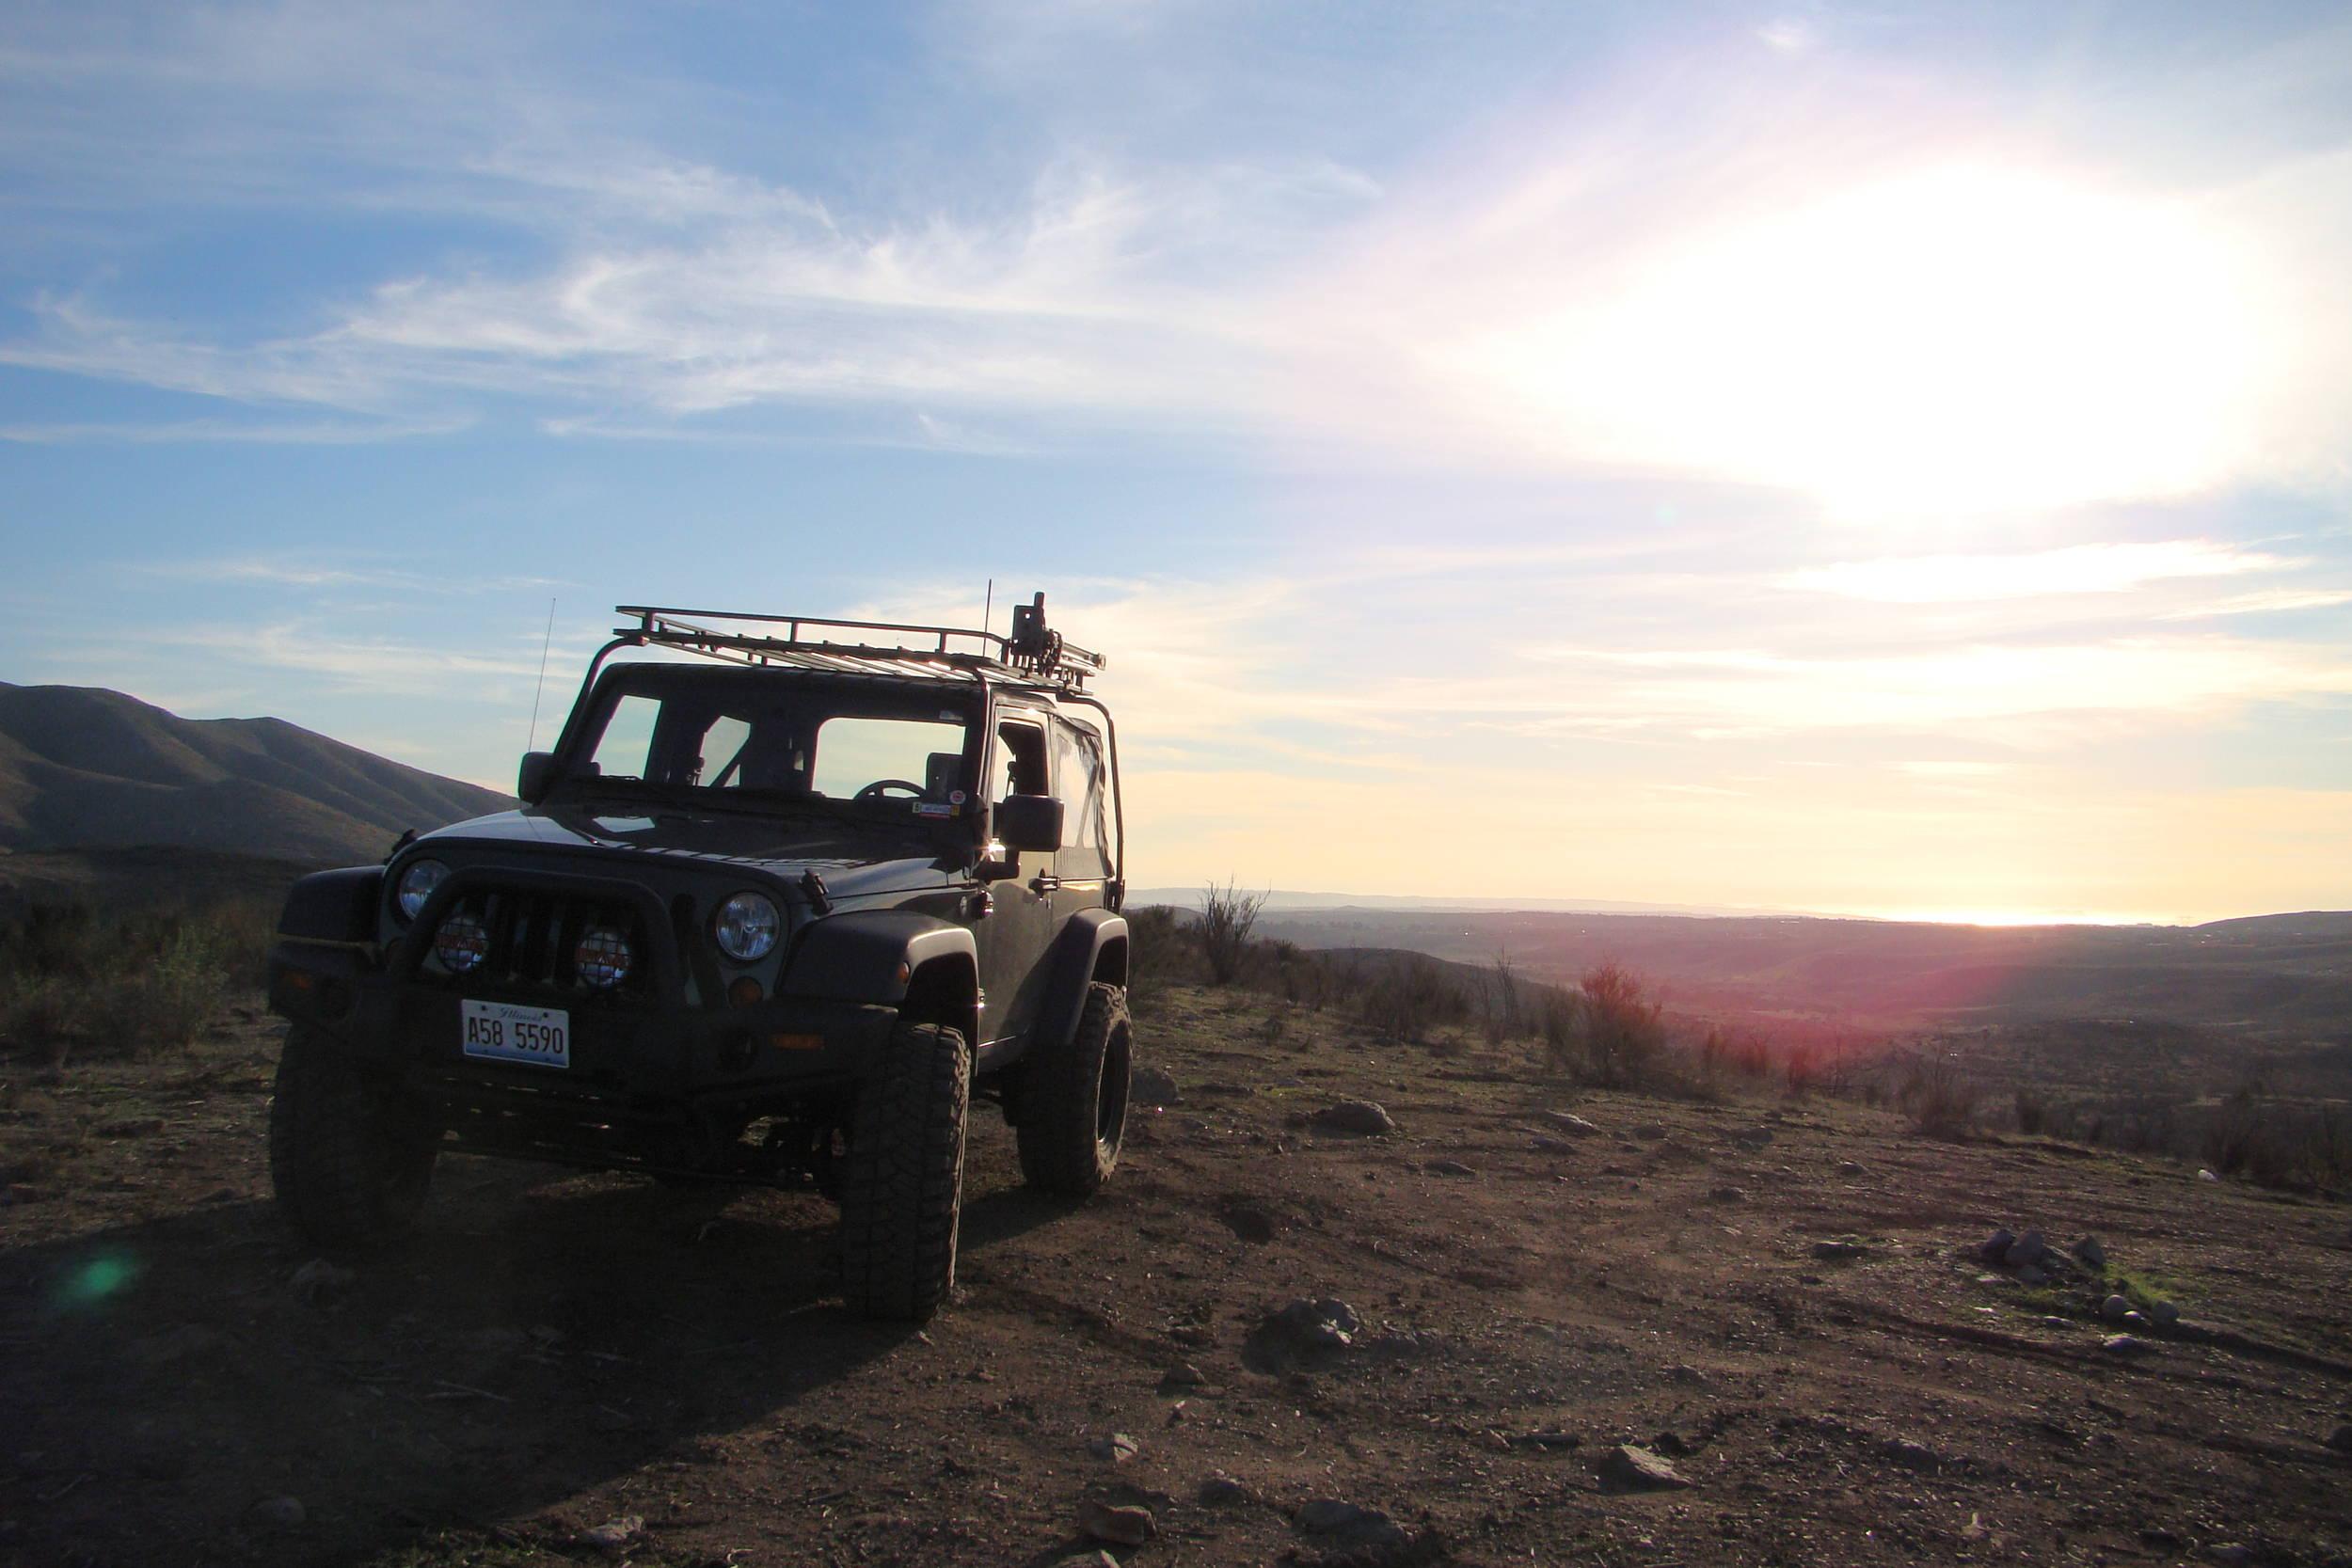 ecto_San_Diego_Jeep.JPG